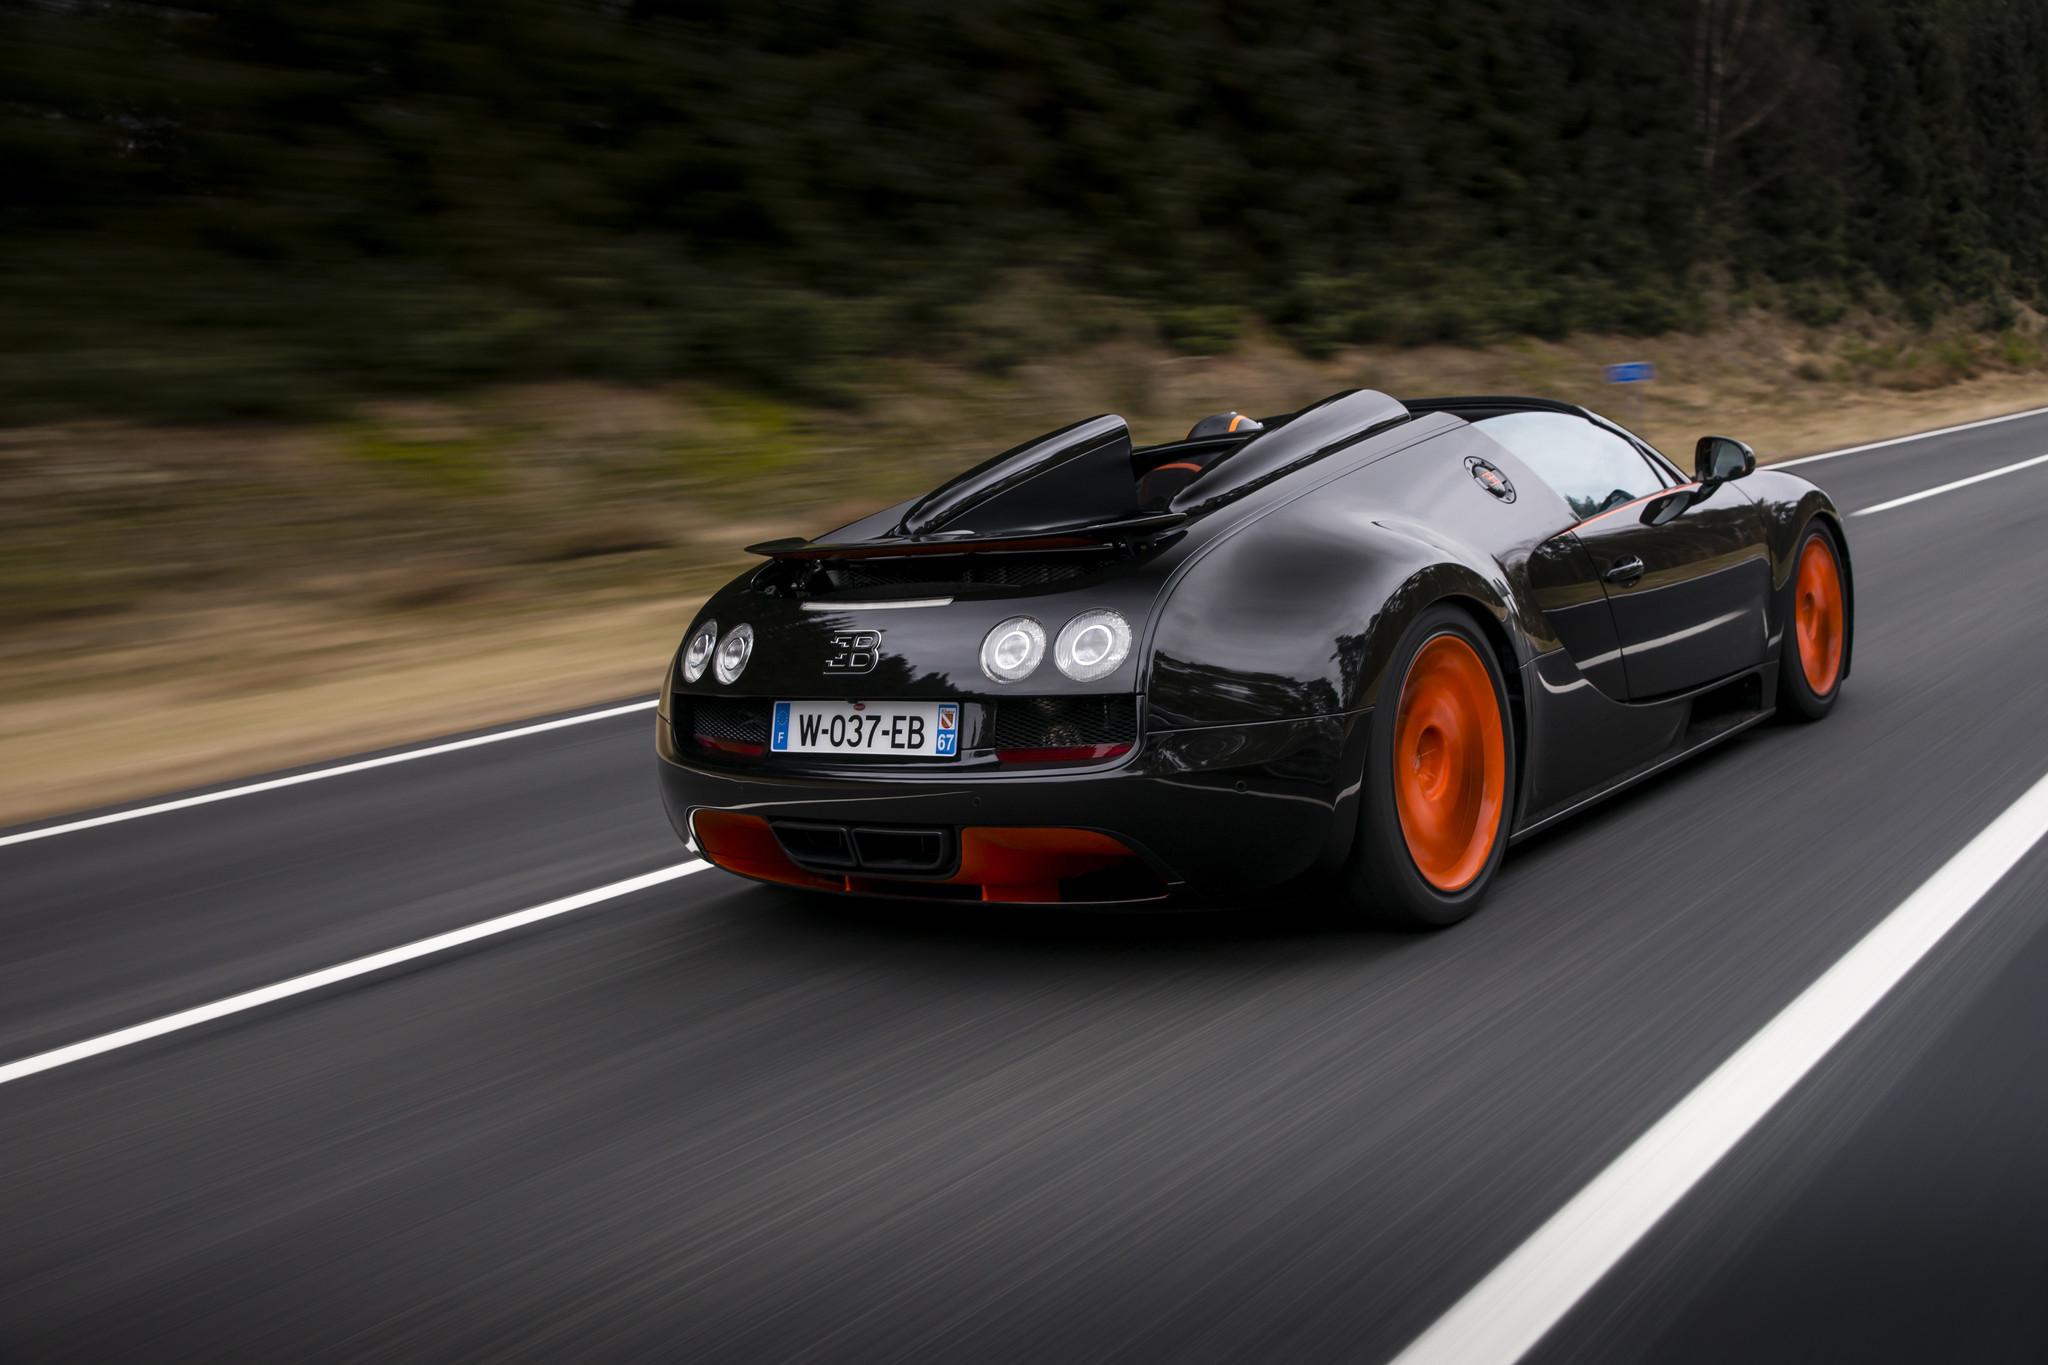 la-fi-hy-autos-bugatti-grand-sport-vitesse-photos Remarkable Bugatti Veyron Grand Sport Vitesse Informacion Cars Trend